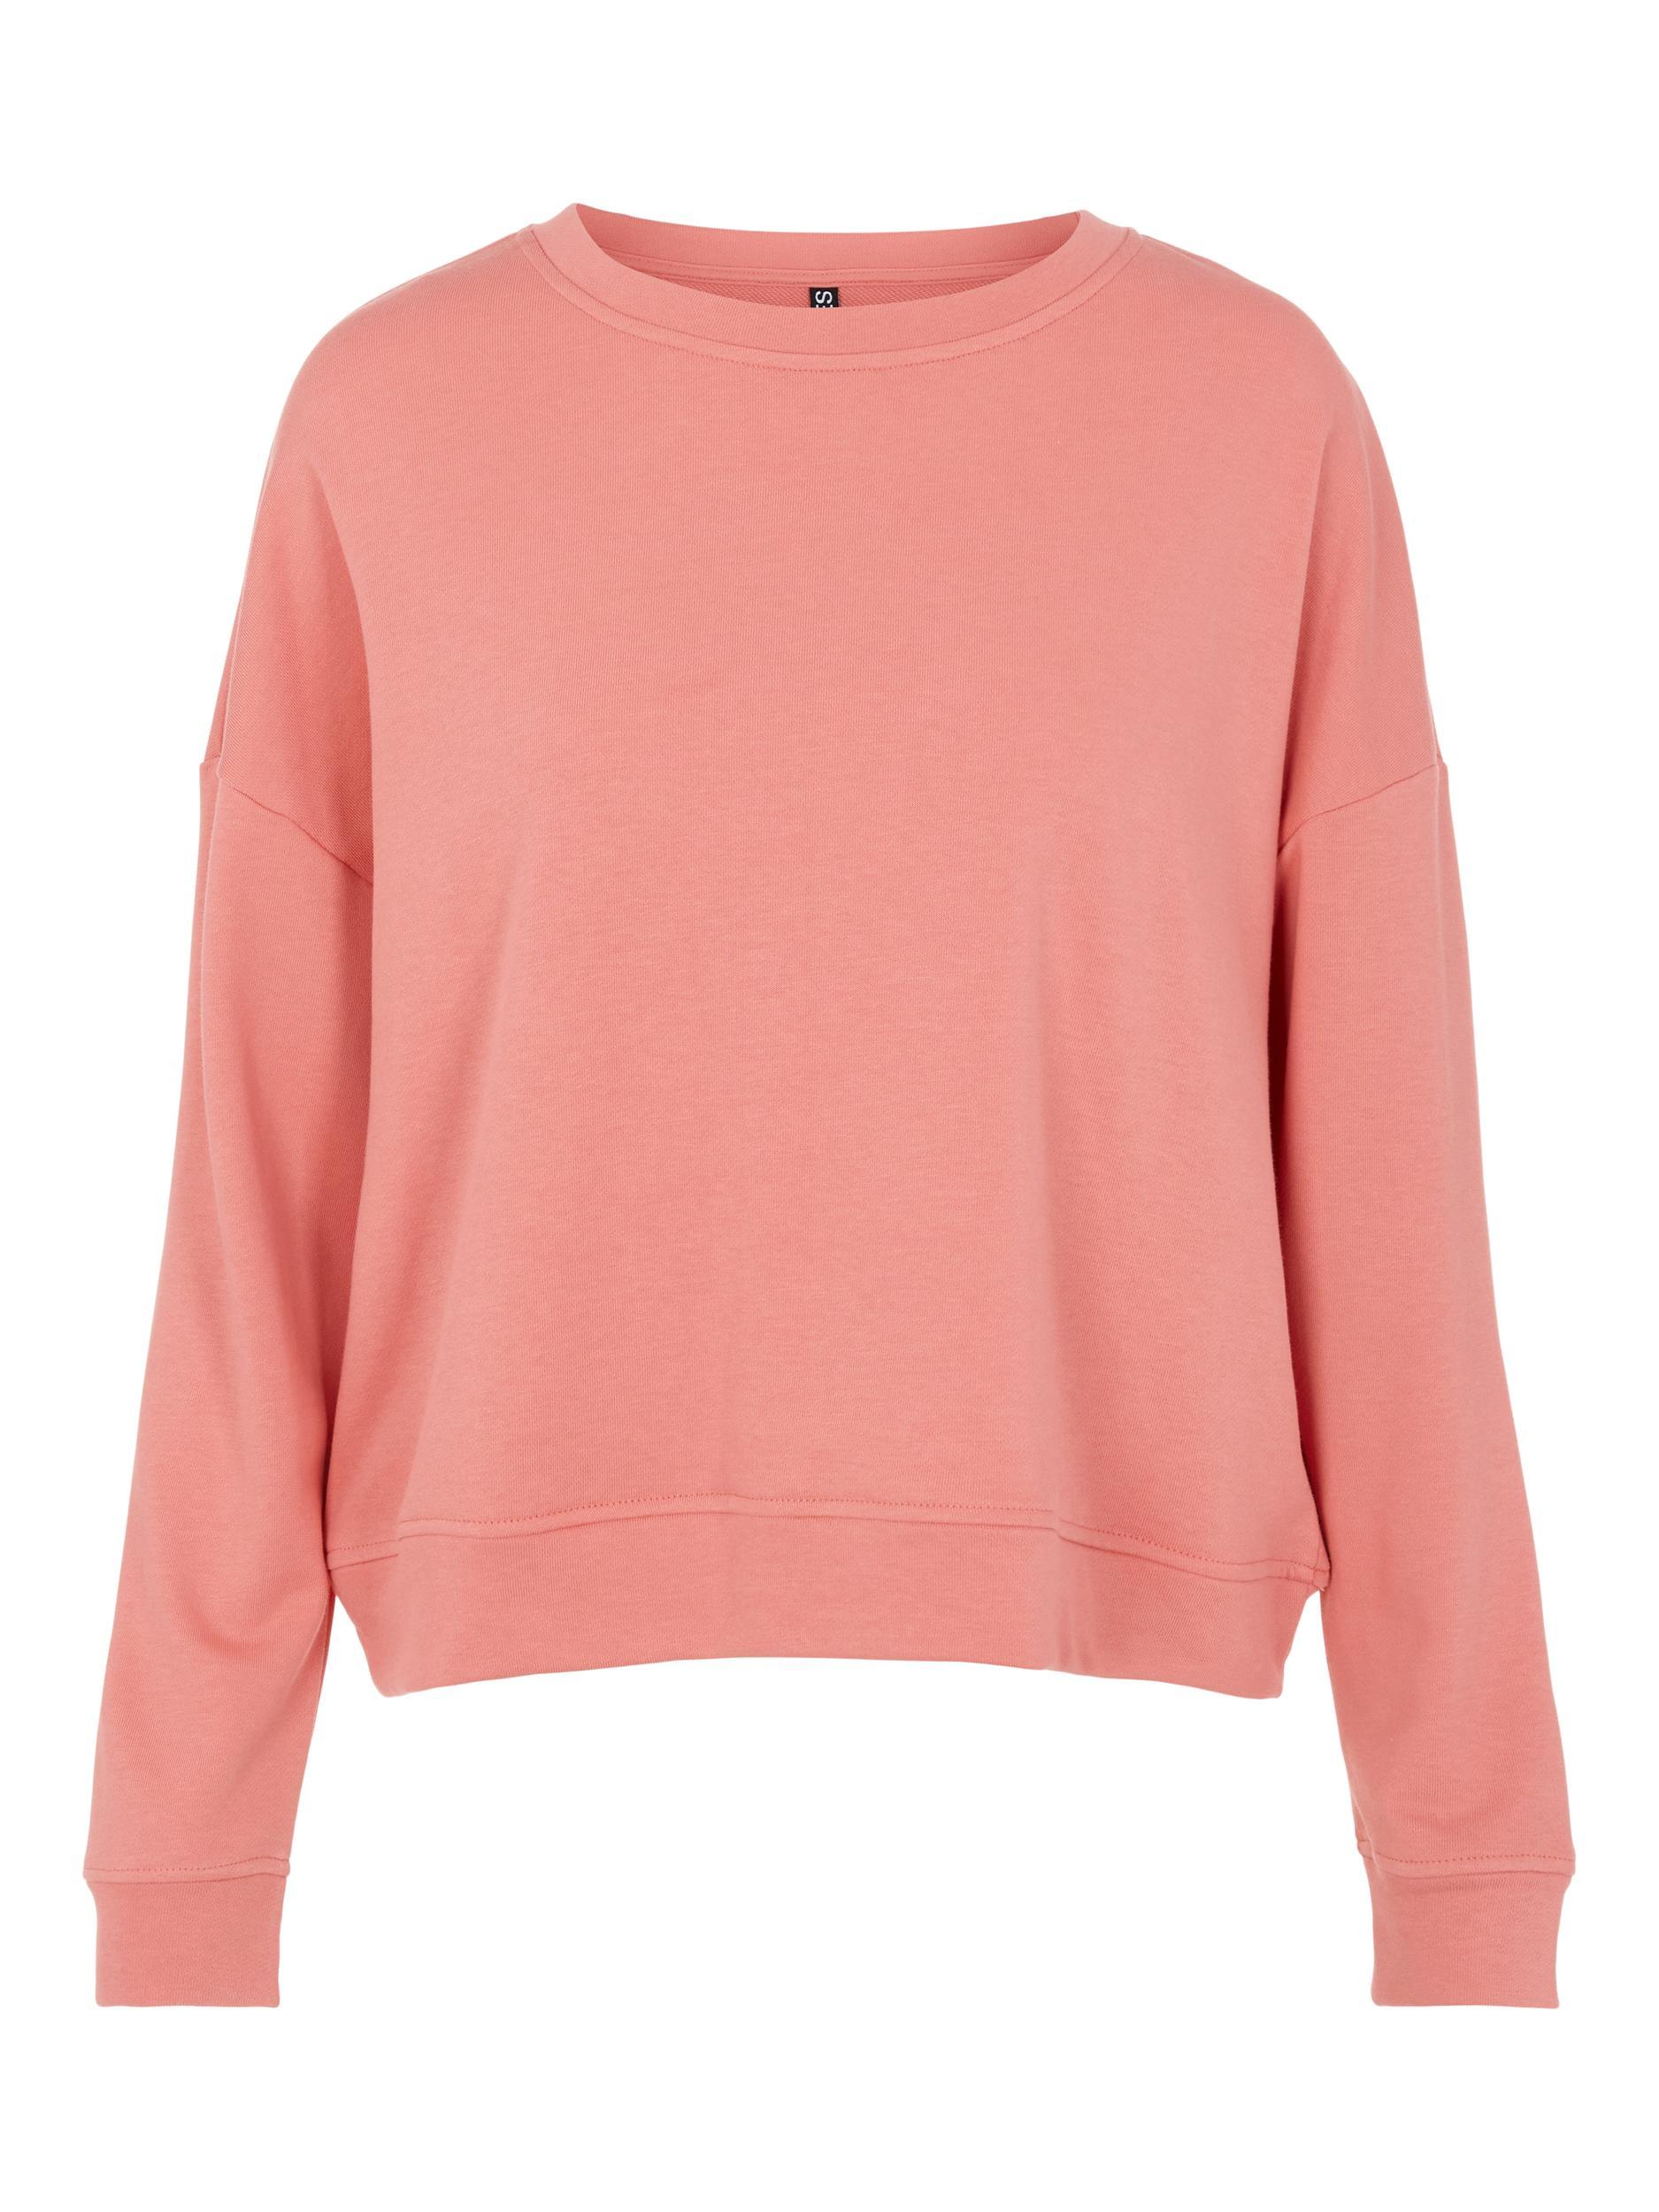 Pieces Chilli Summer sweatshirt, tea rose, large